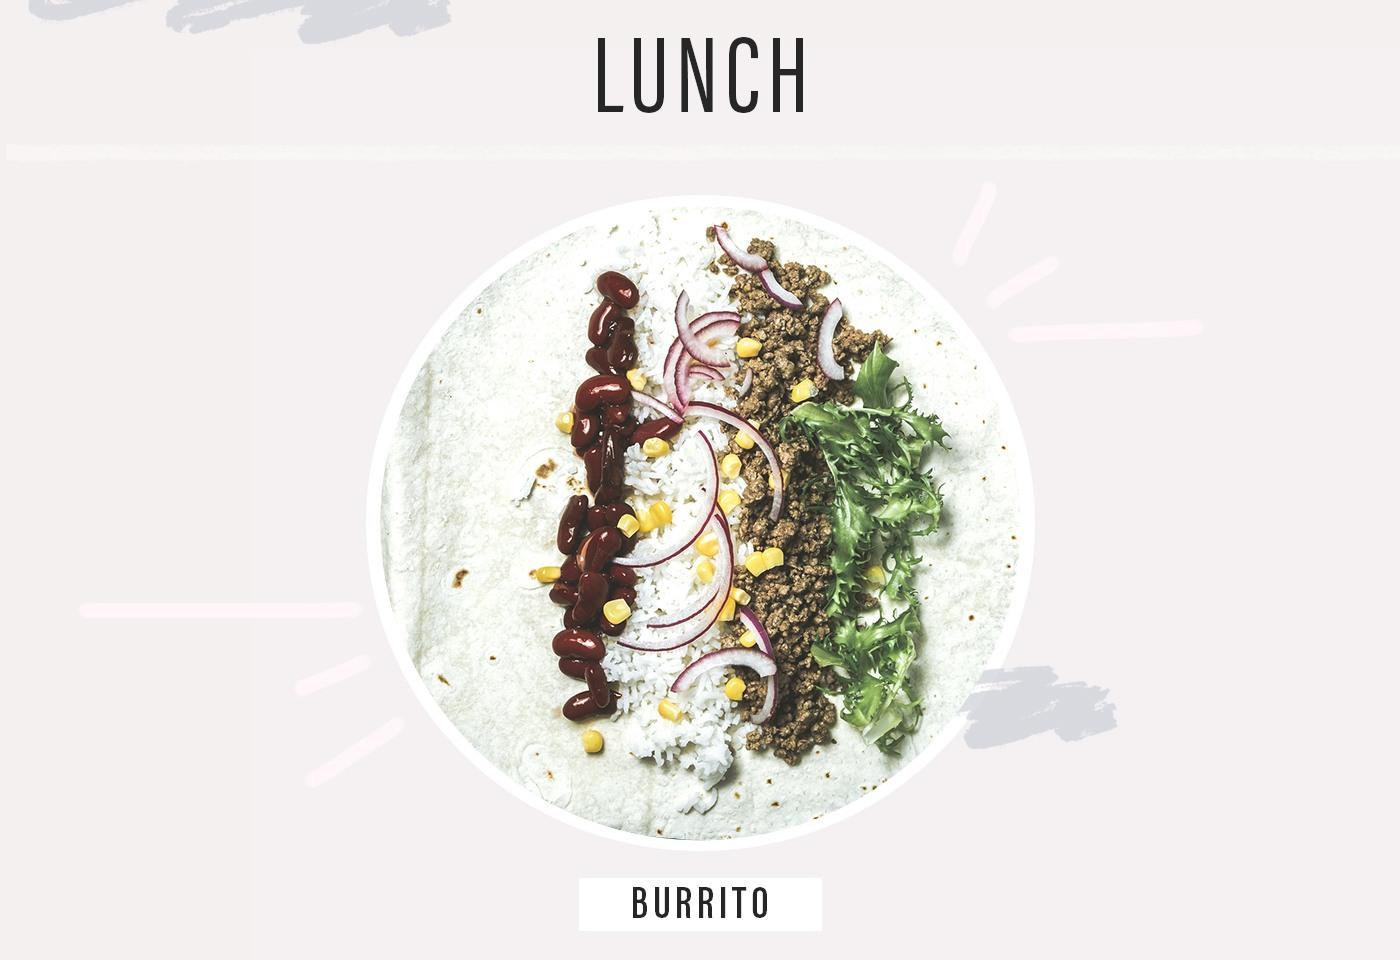 slt instructor amy paulin's lunch healthy burrito